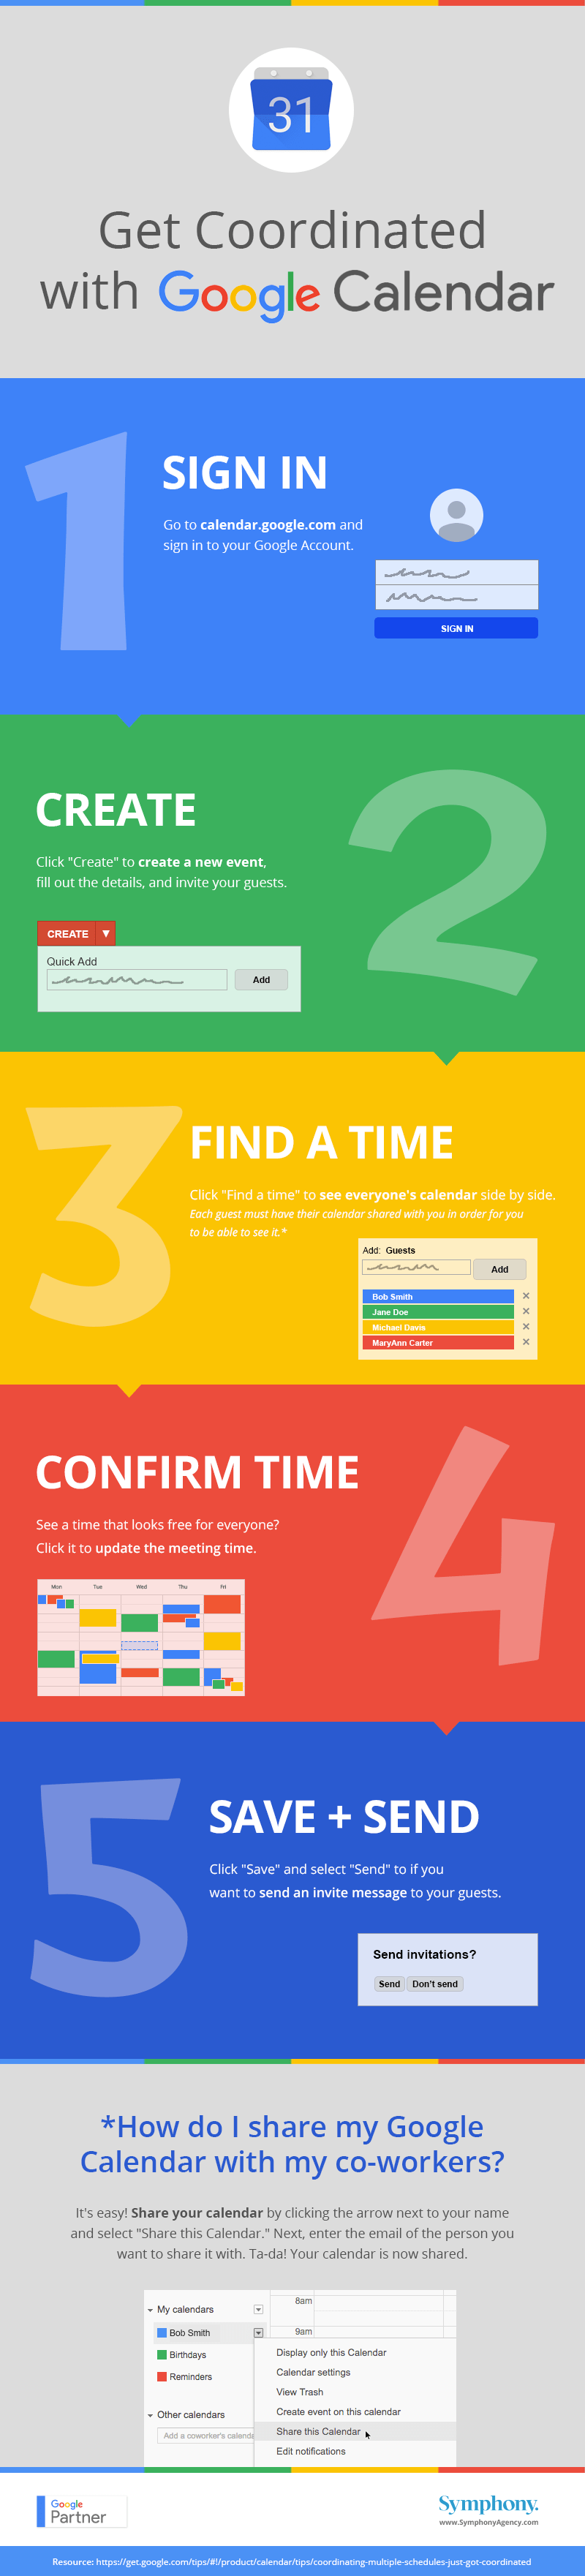 sym-1610-google-tip-infographic